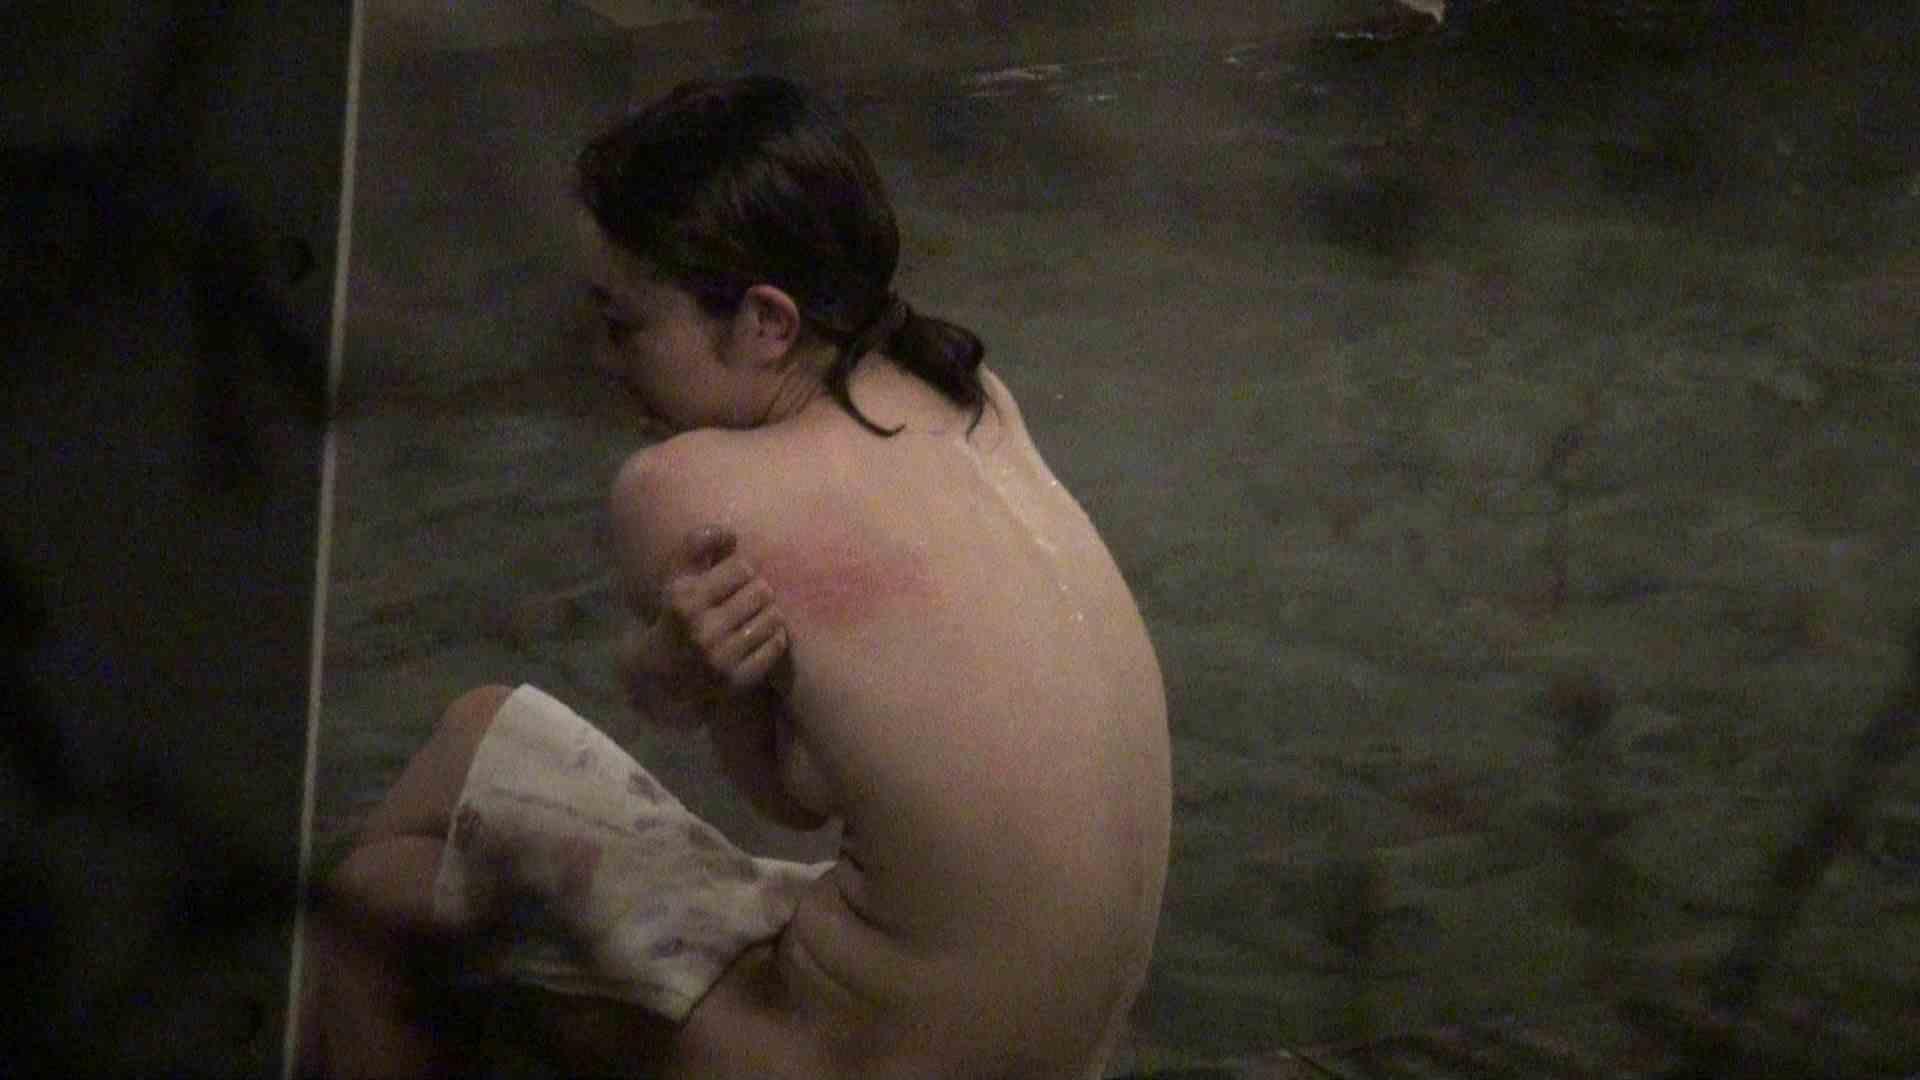 Aquaな露天風呂Vol.330 盗撮   HなOL  83pic 77